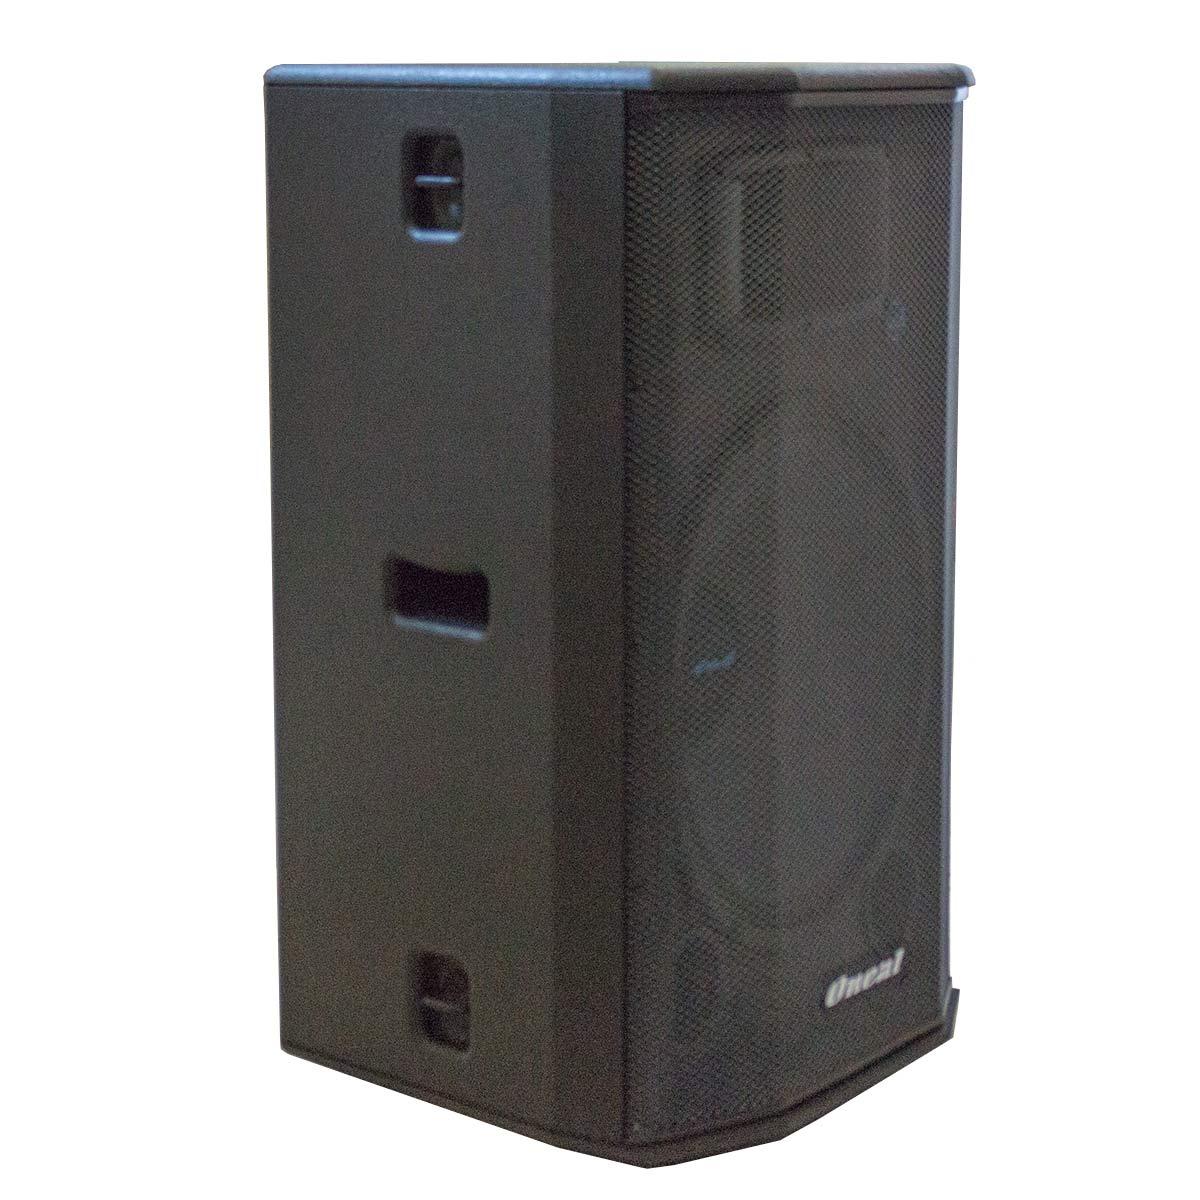 Caixa Ativa fal 15 Pol 400W - OPB 1035  Oneal